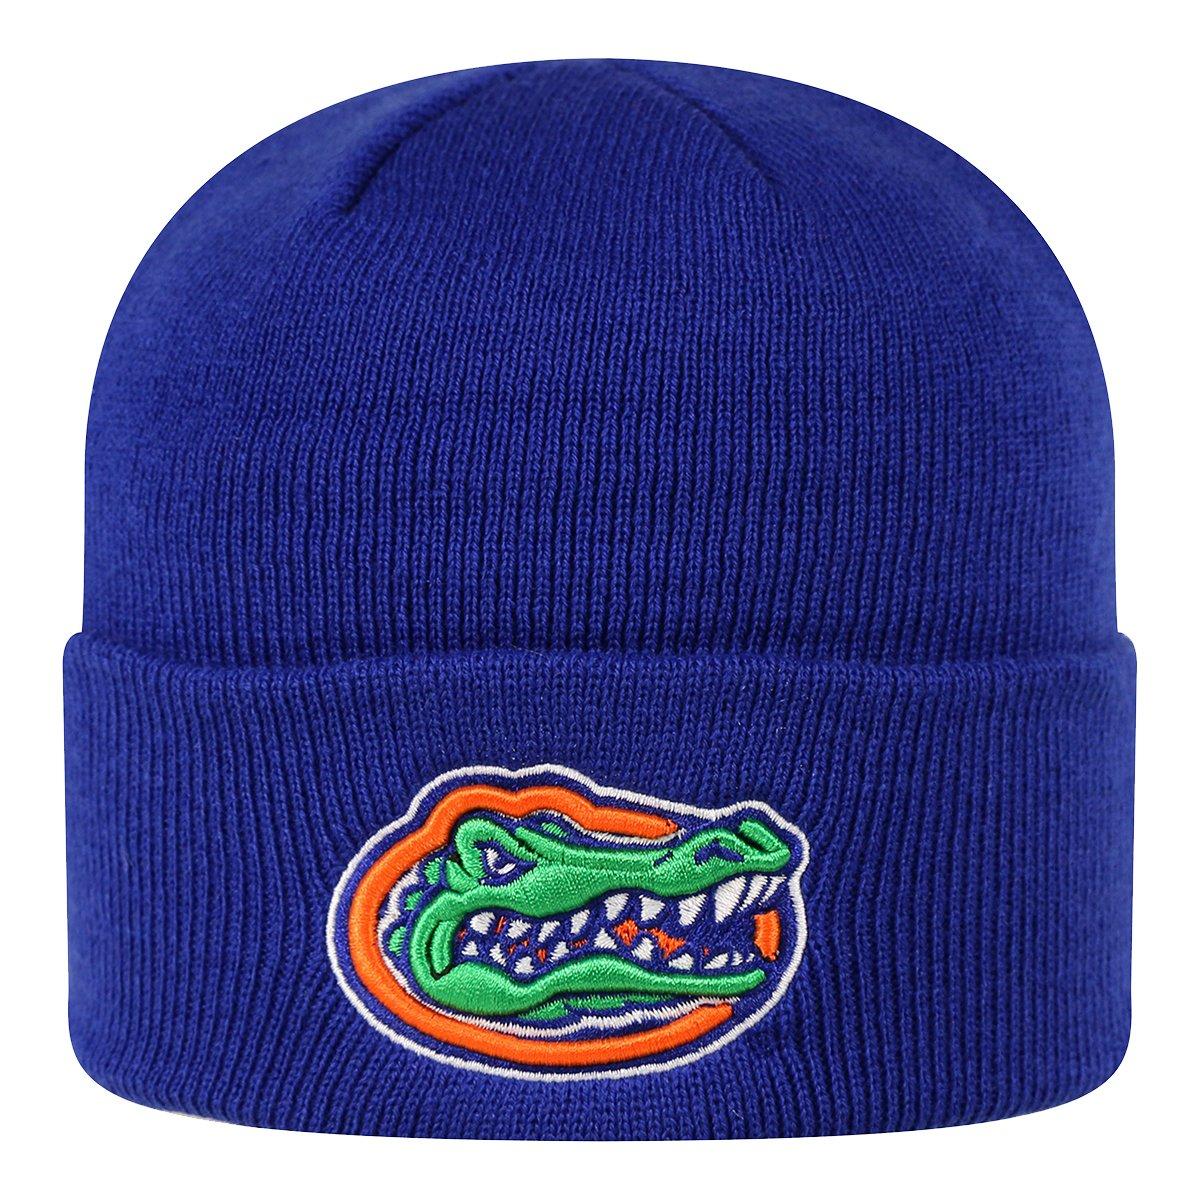 Top of the World 2-Sided Cuffed Beanie Hat NCAA EZ DOZIT Cuff Knit Toque Cap